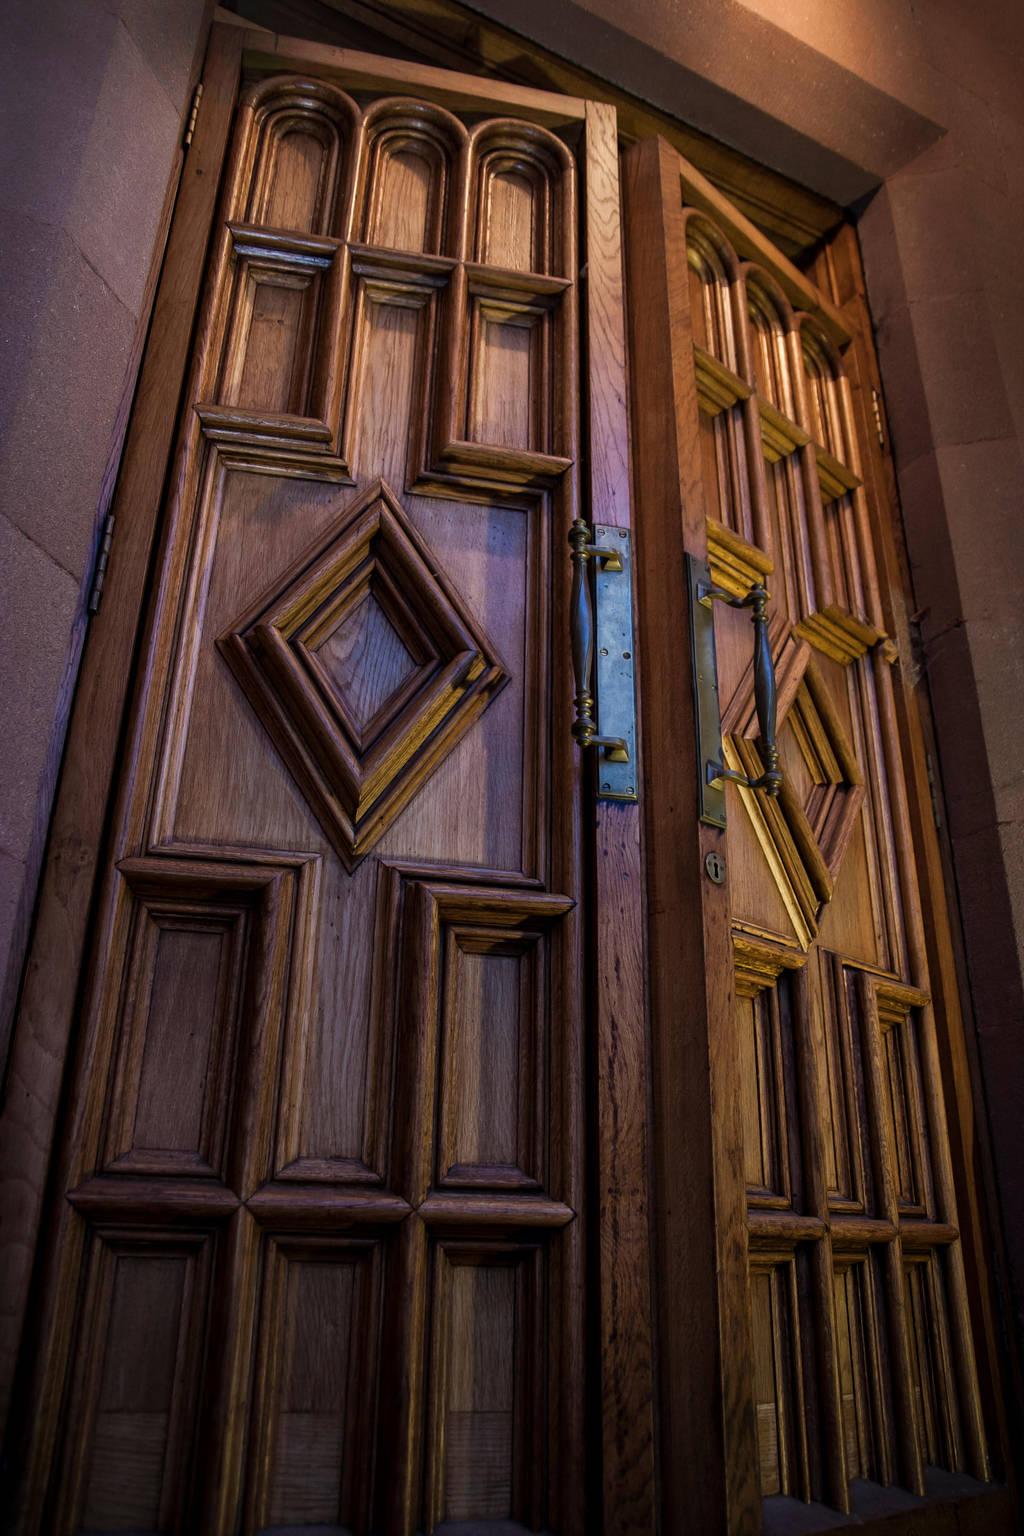 A Doorway by jamieoliver22